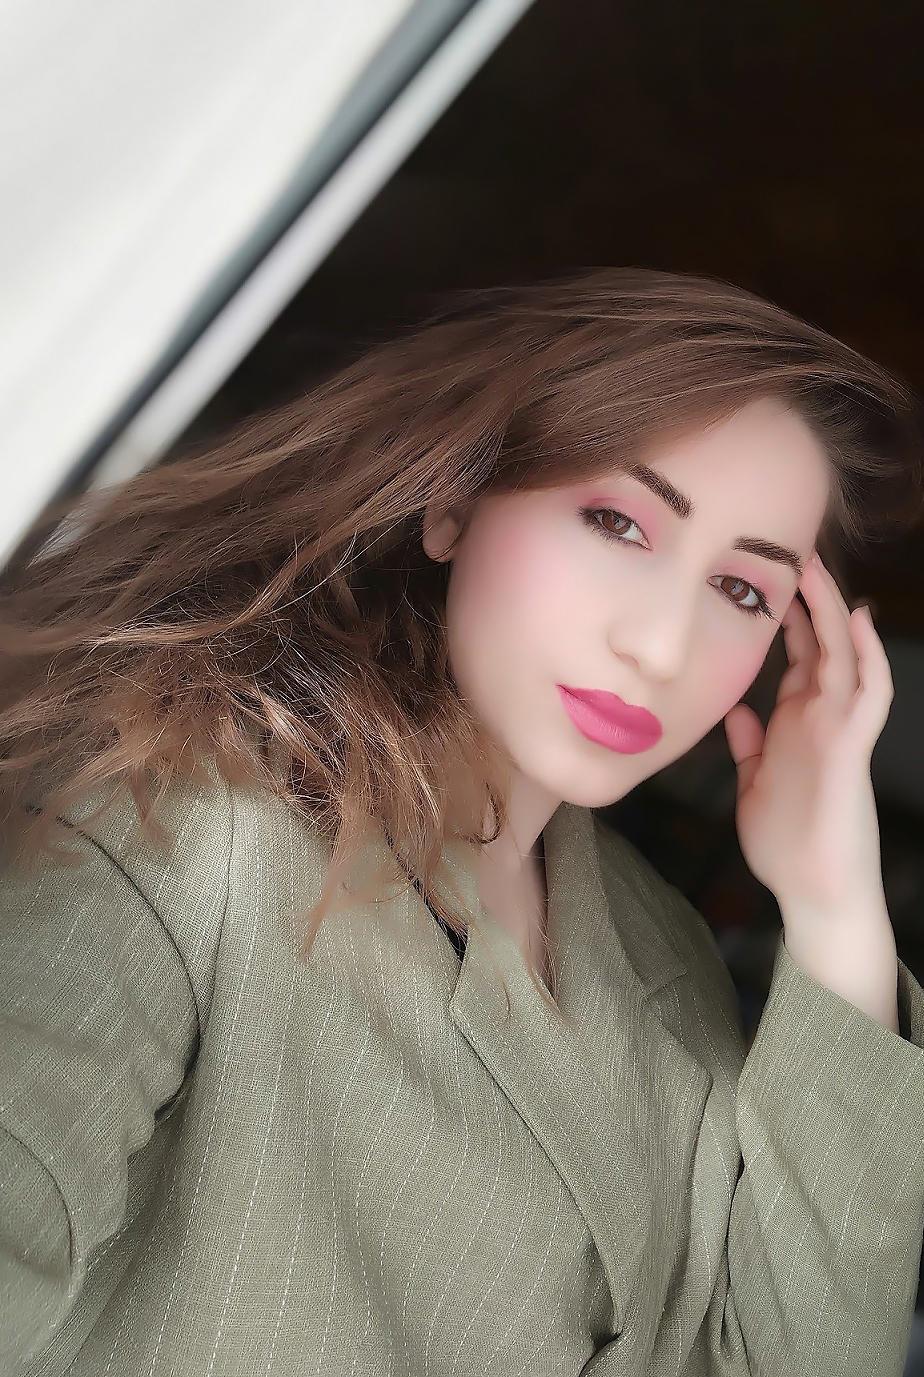 lorena-stroka-foto-biografia-mosha-height-wikipedia-facebook-instagram-bashkeshorti-gazetare-books-albstroka-keshilla